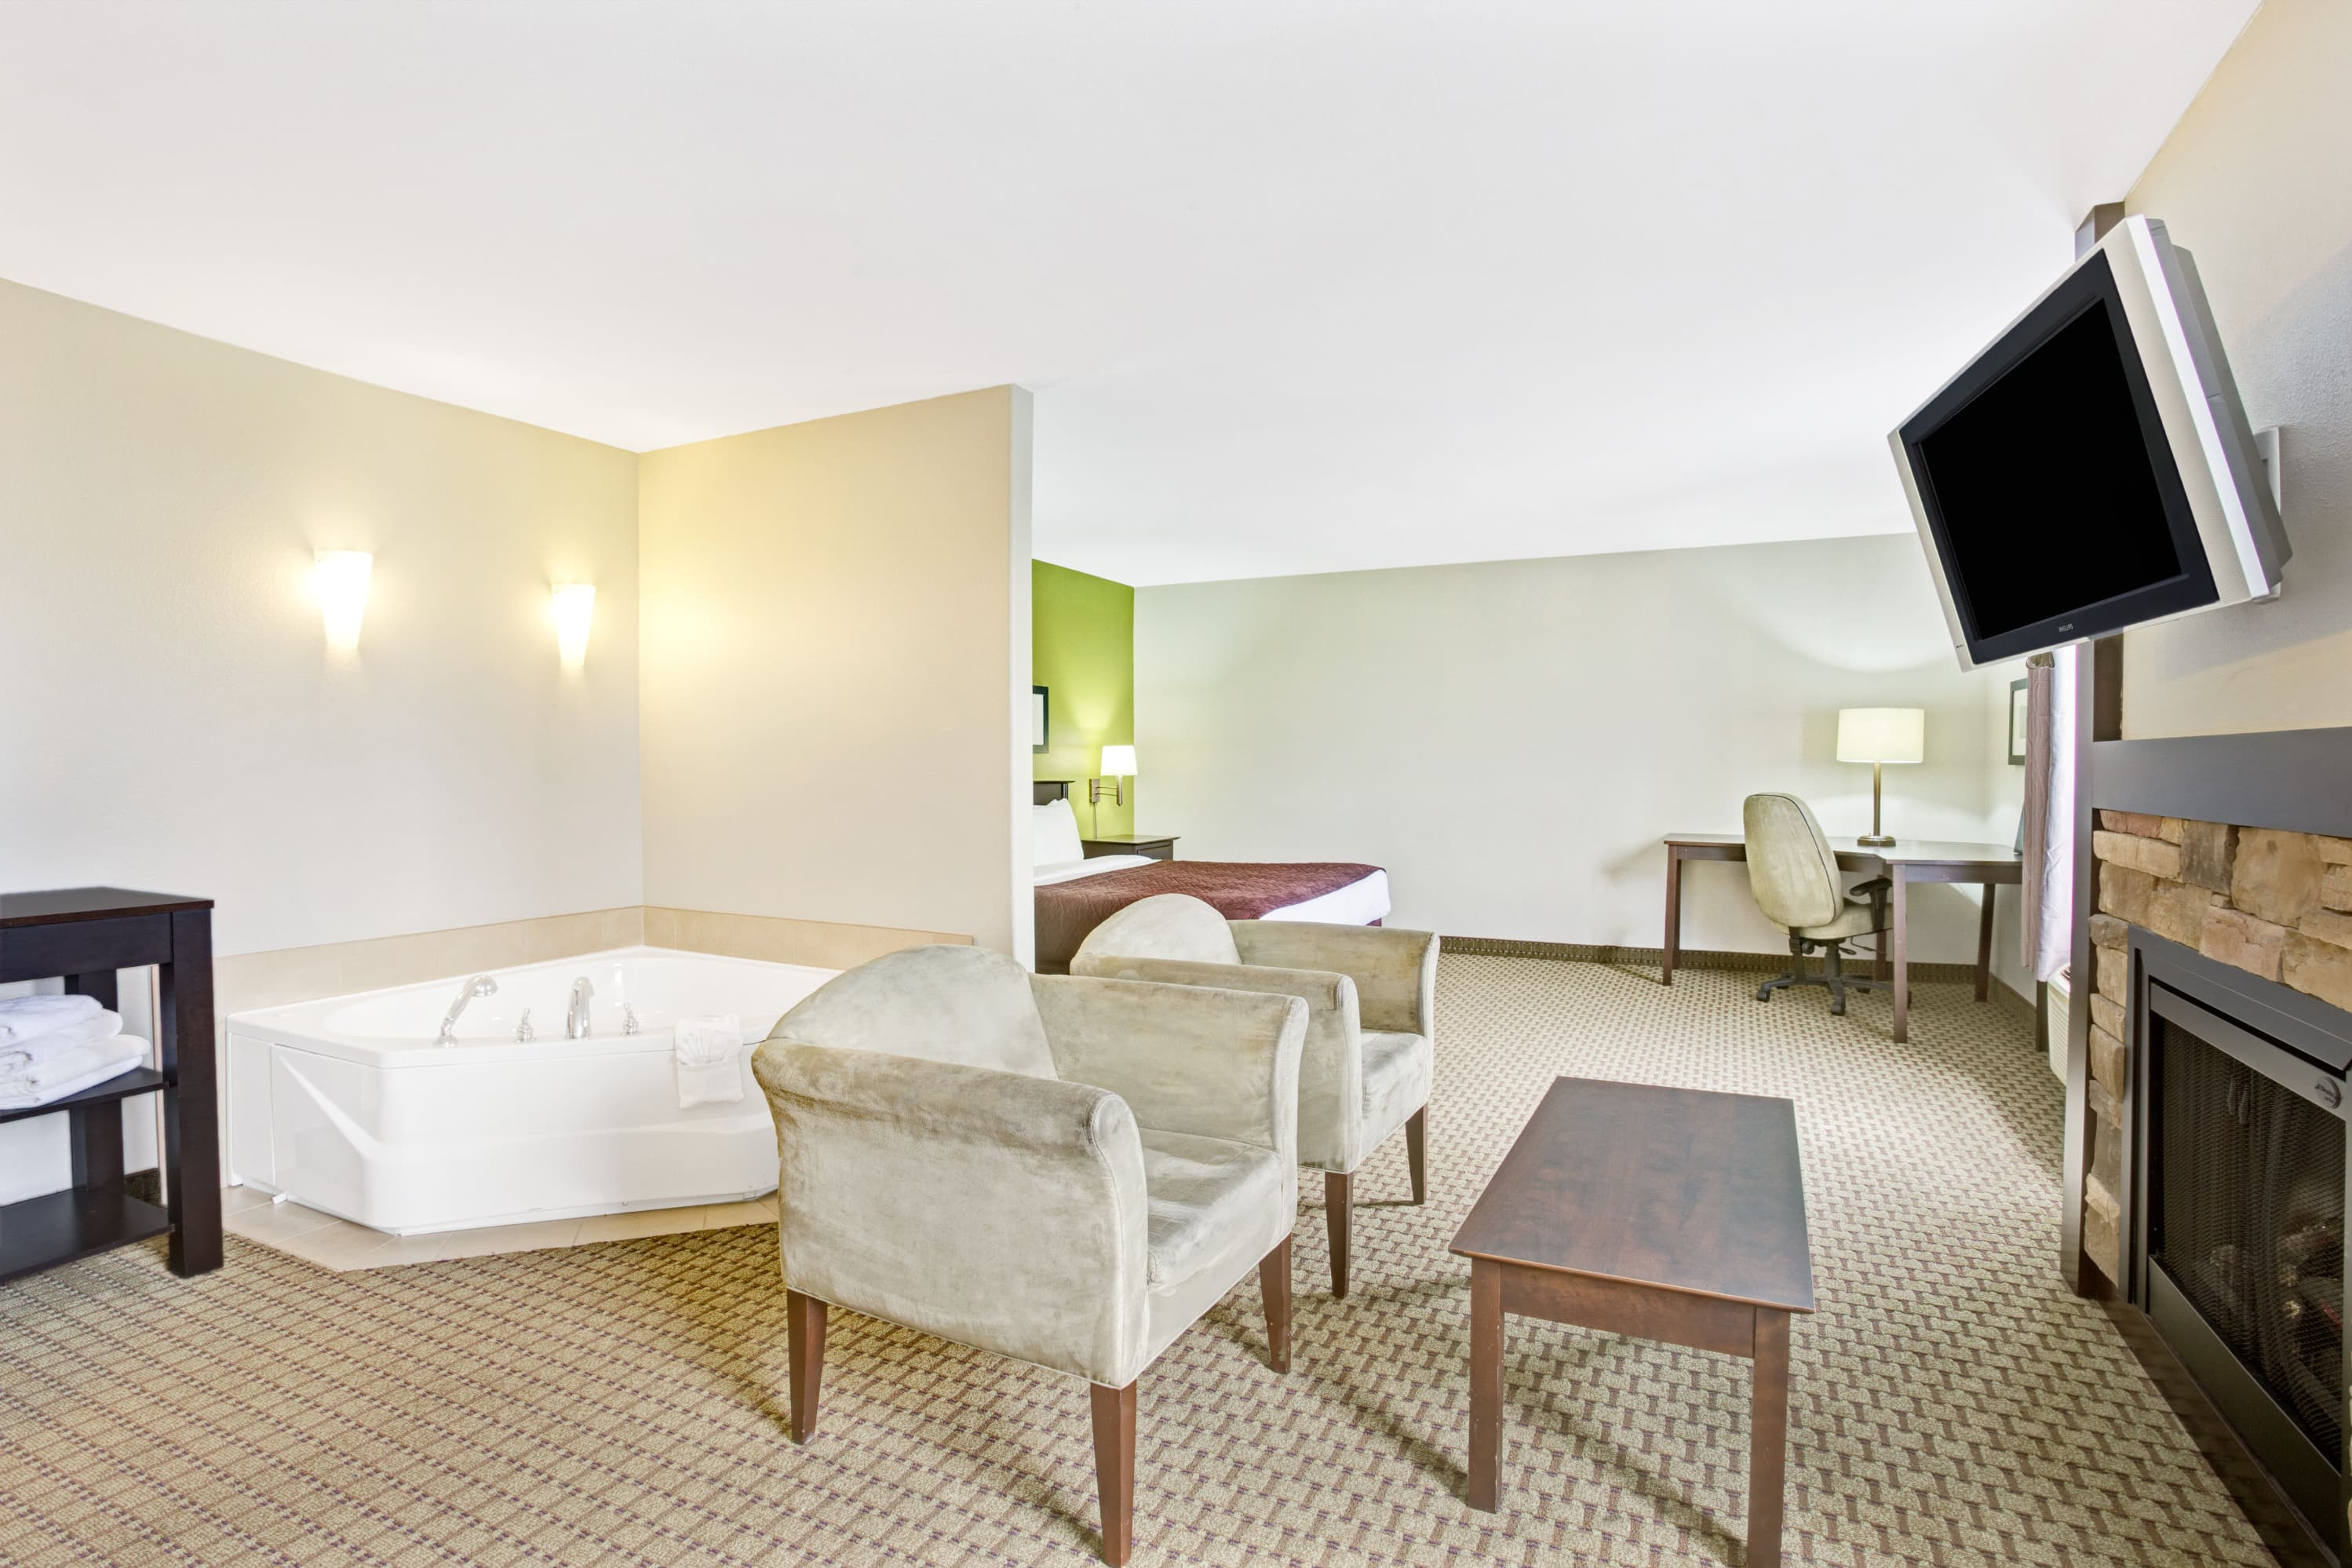 Super 8 by Wyndham St-Jerome suite in Saint-Jerome, Quebec